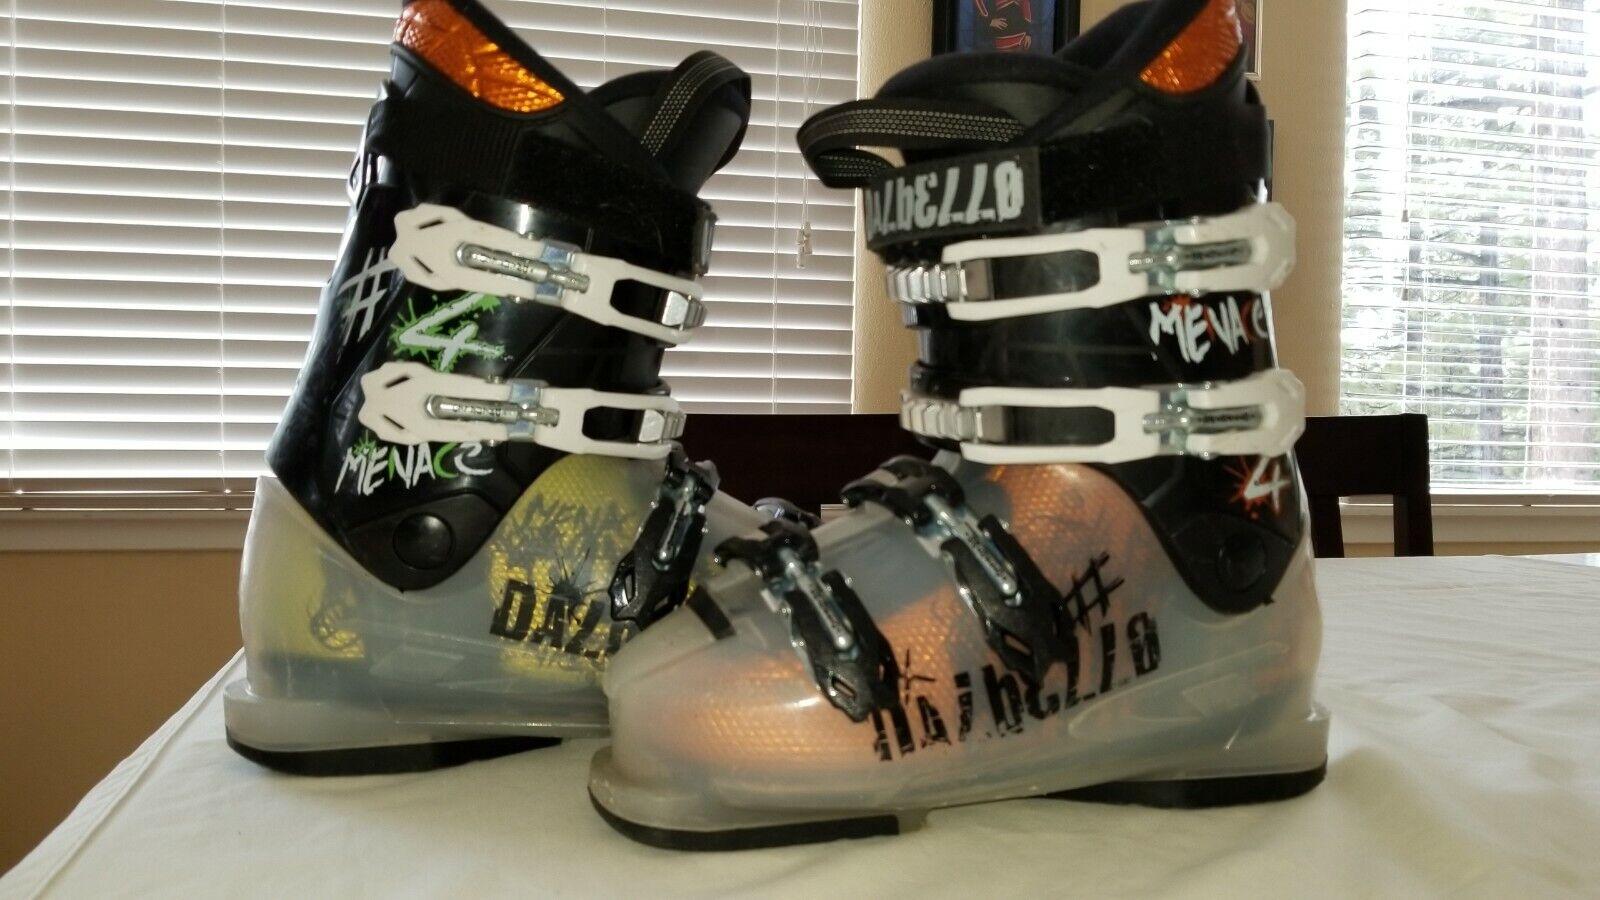 Dalbello Menace Ski boots-Youth 279mm  Size 5